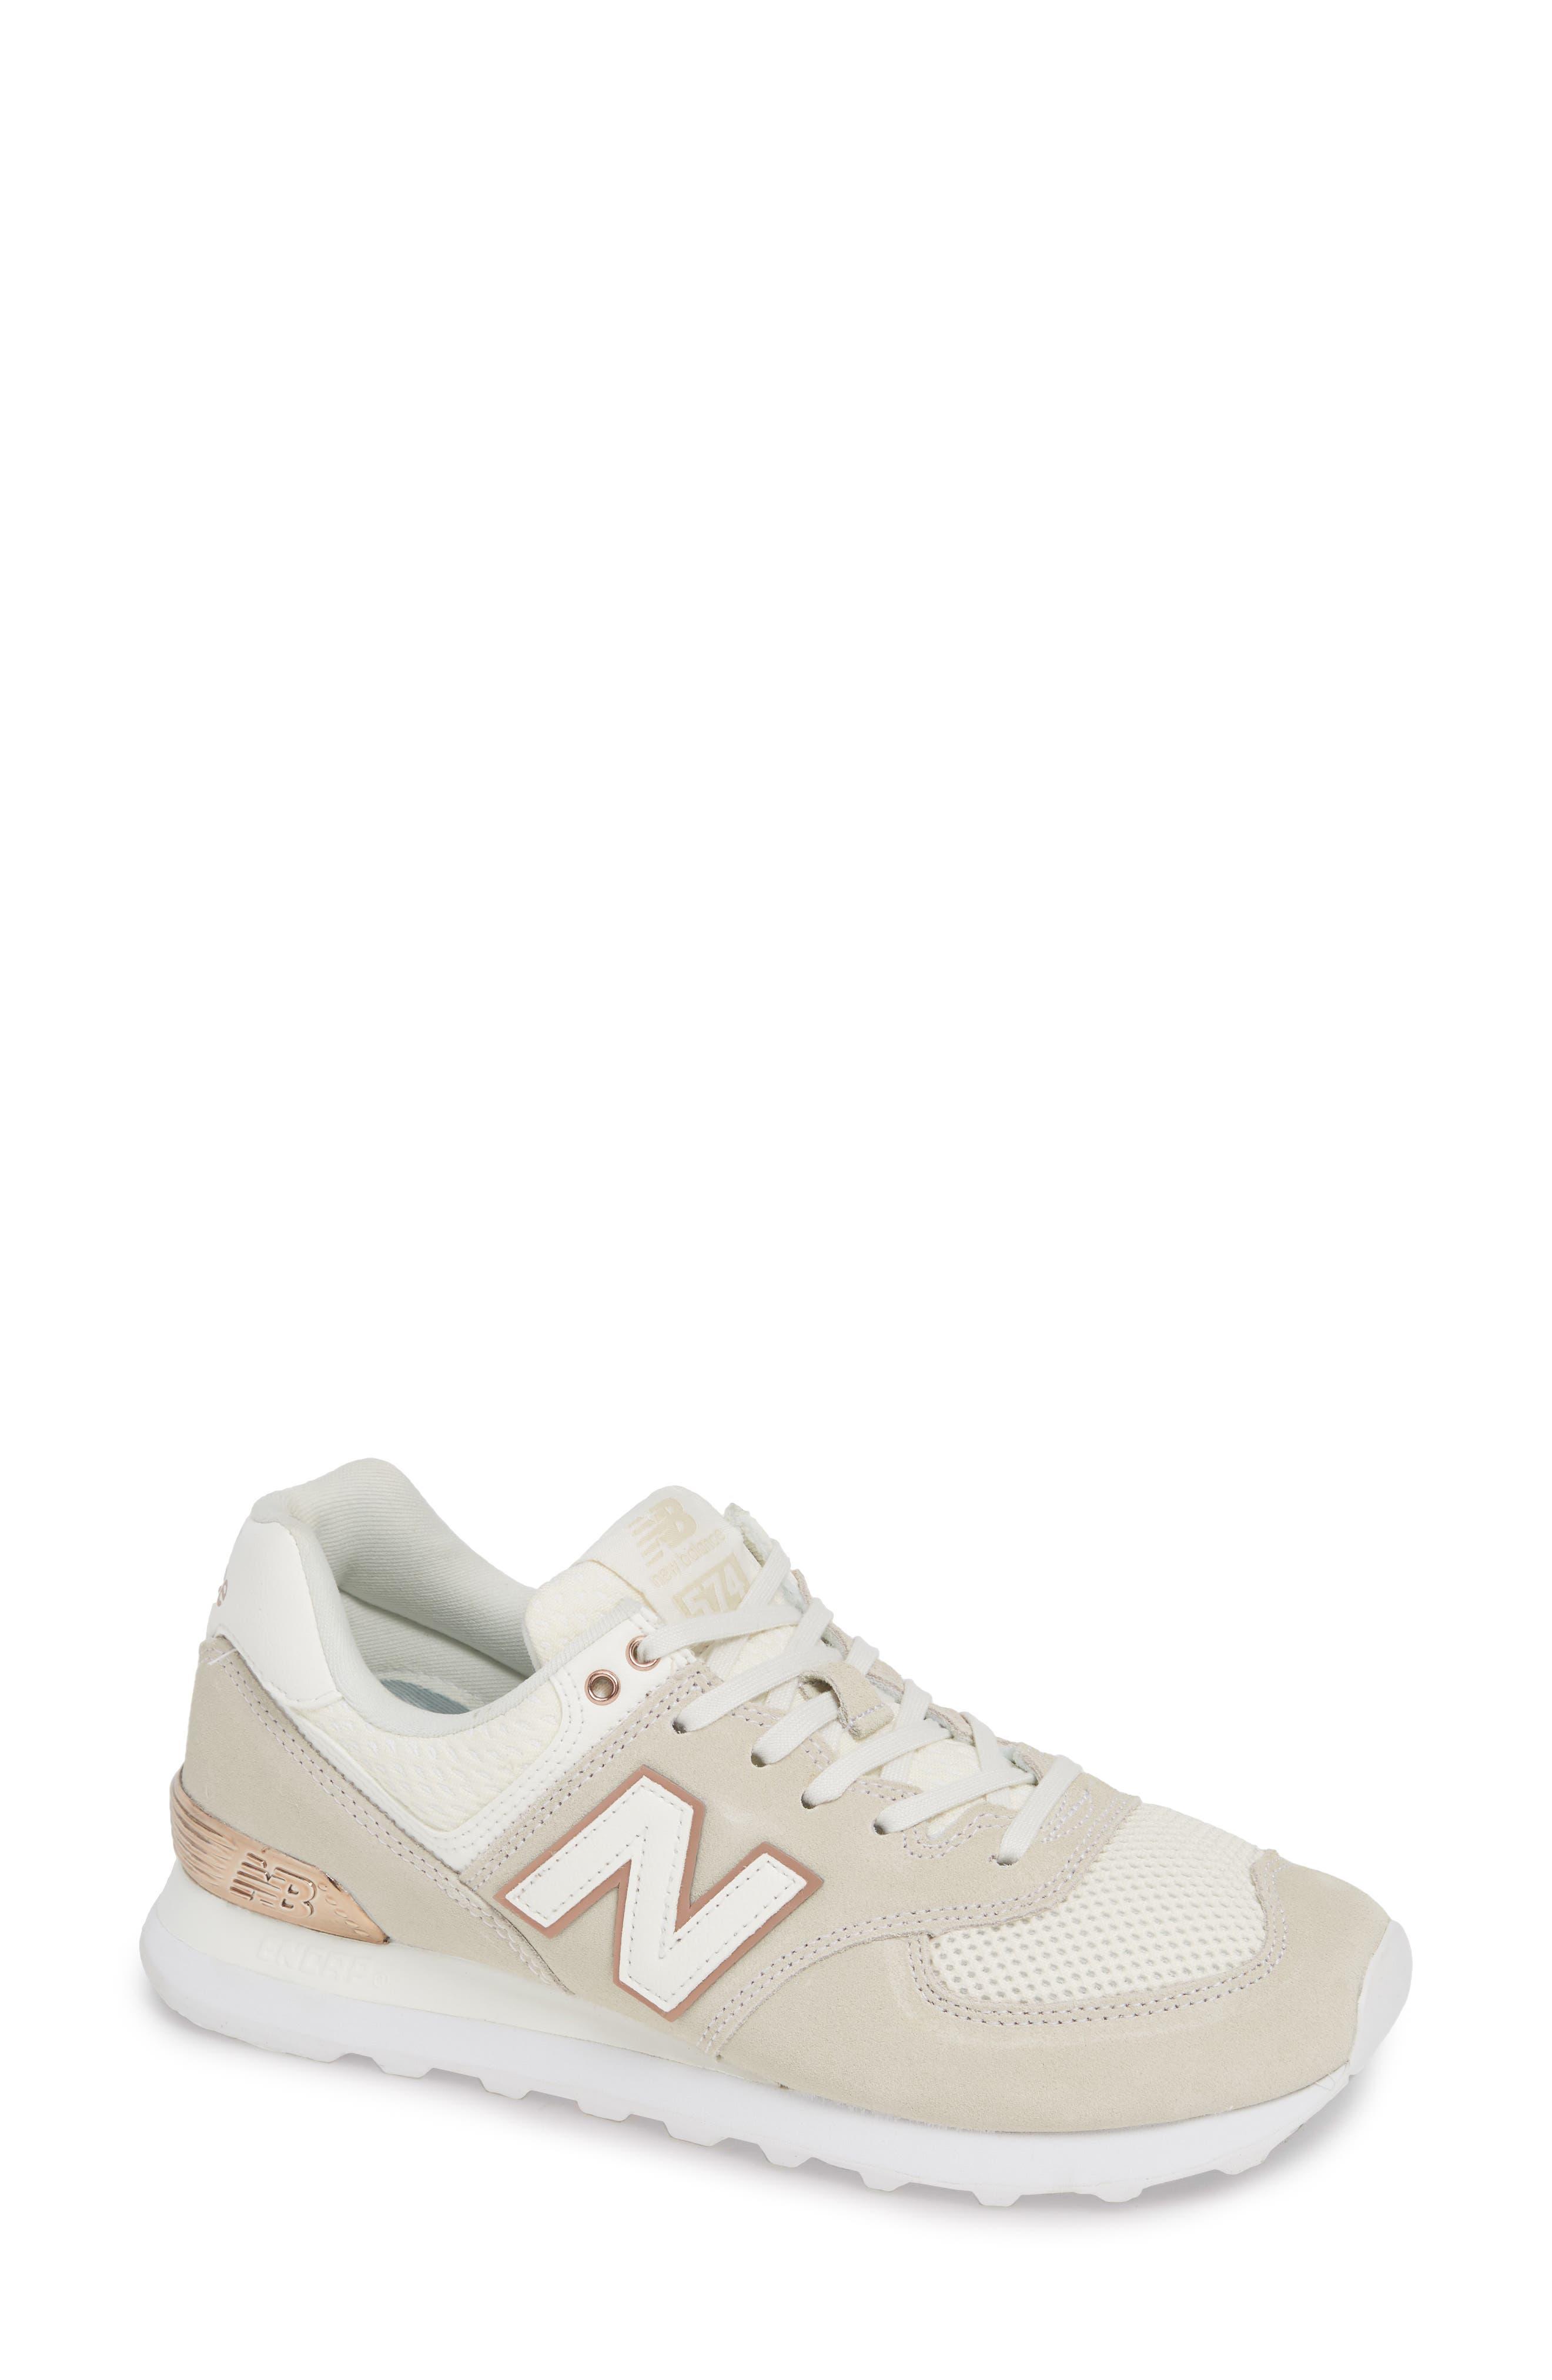 '574' Sneaker,                             Main thumbnail 1, color,                             021